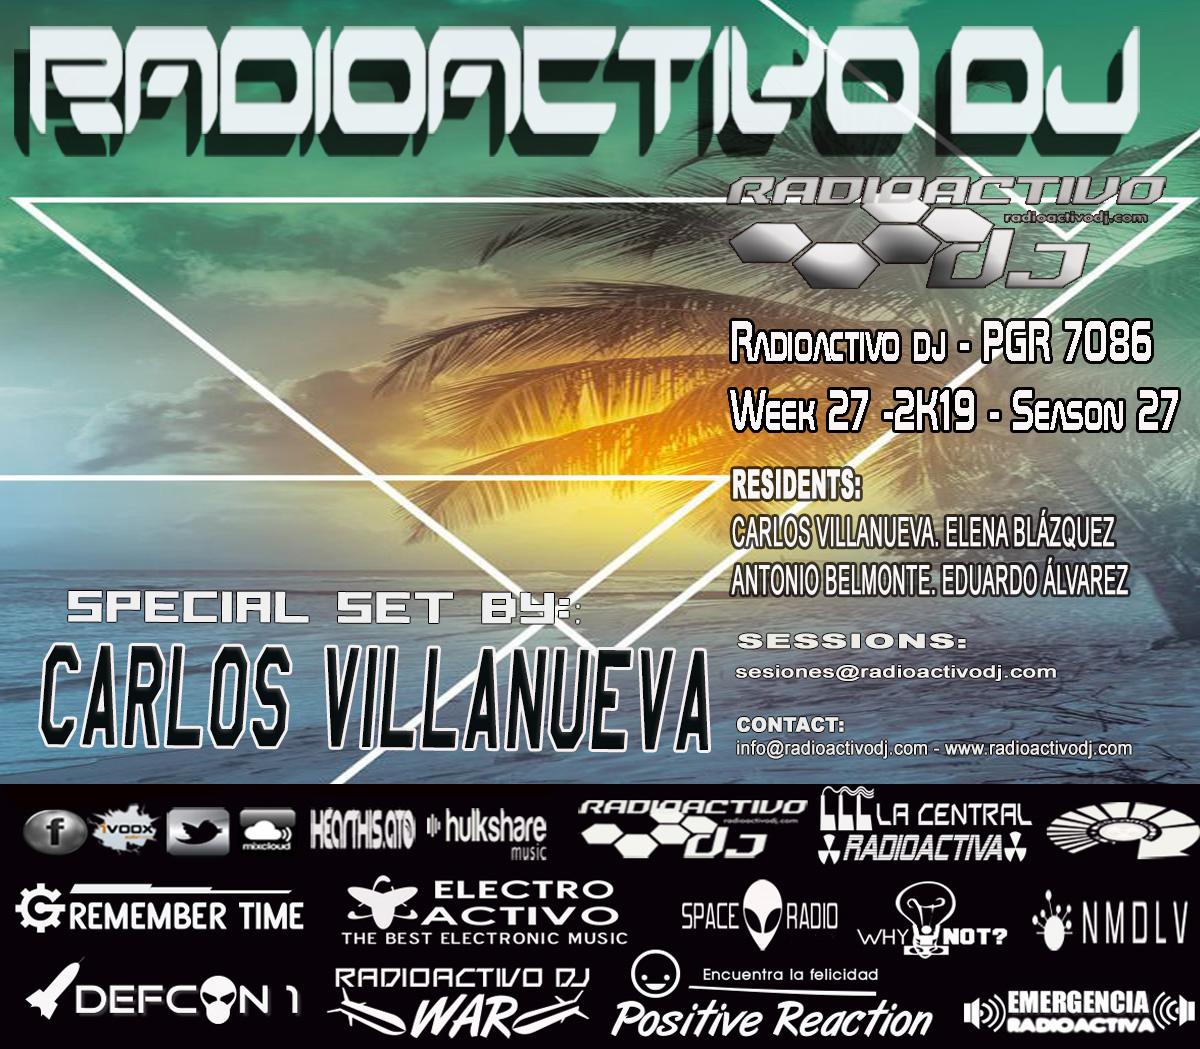 RADIOACTIVO-DJ-27-2019